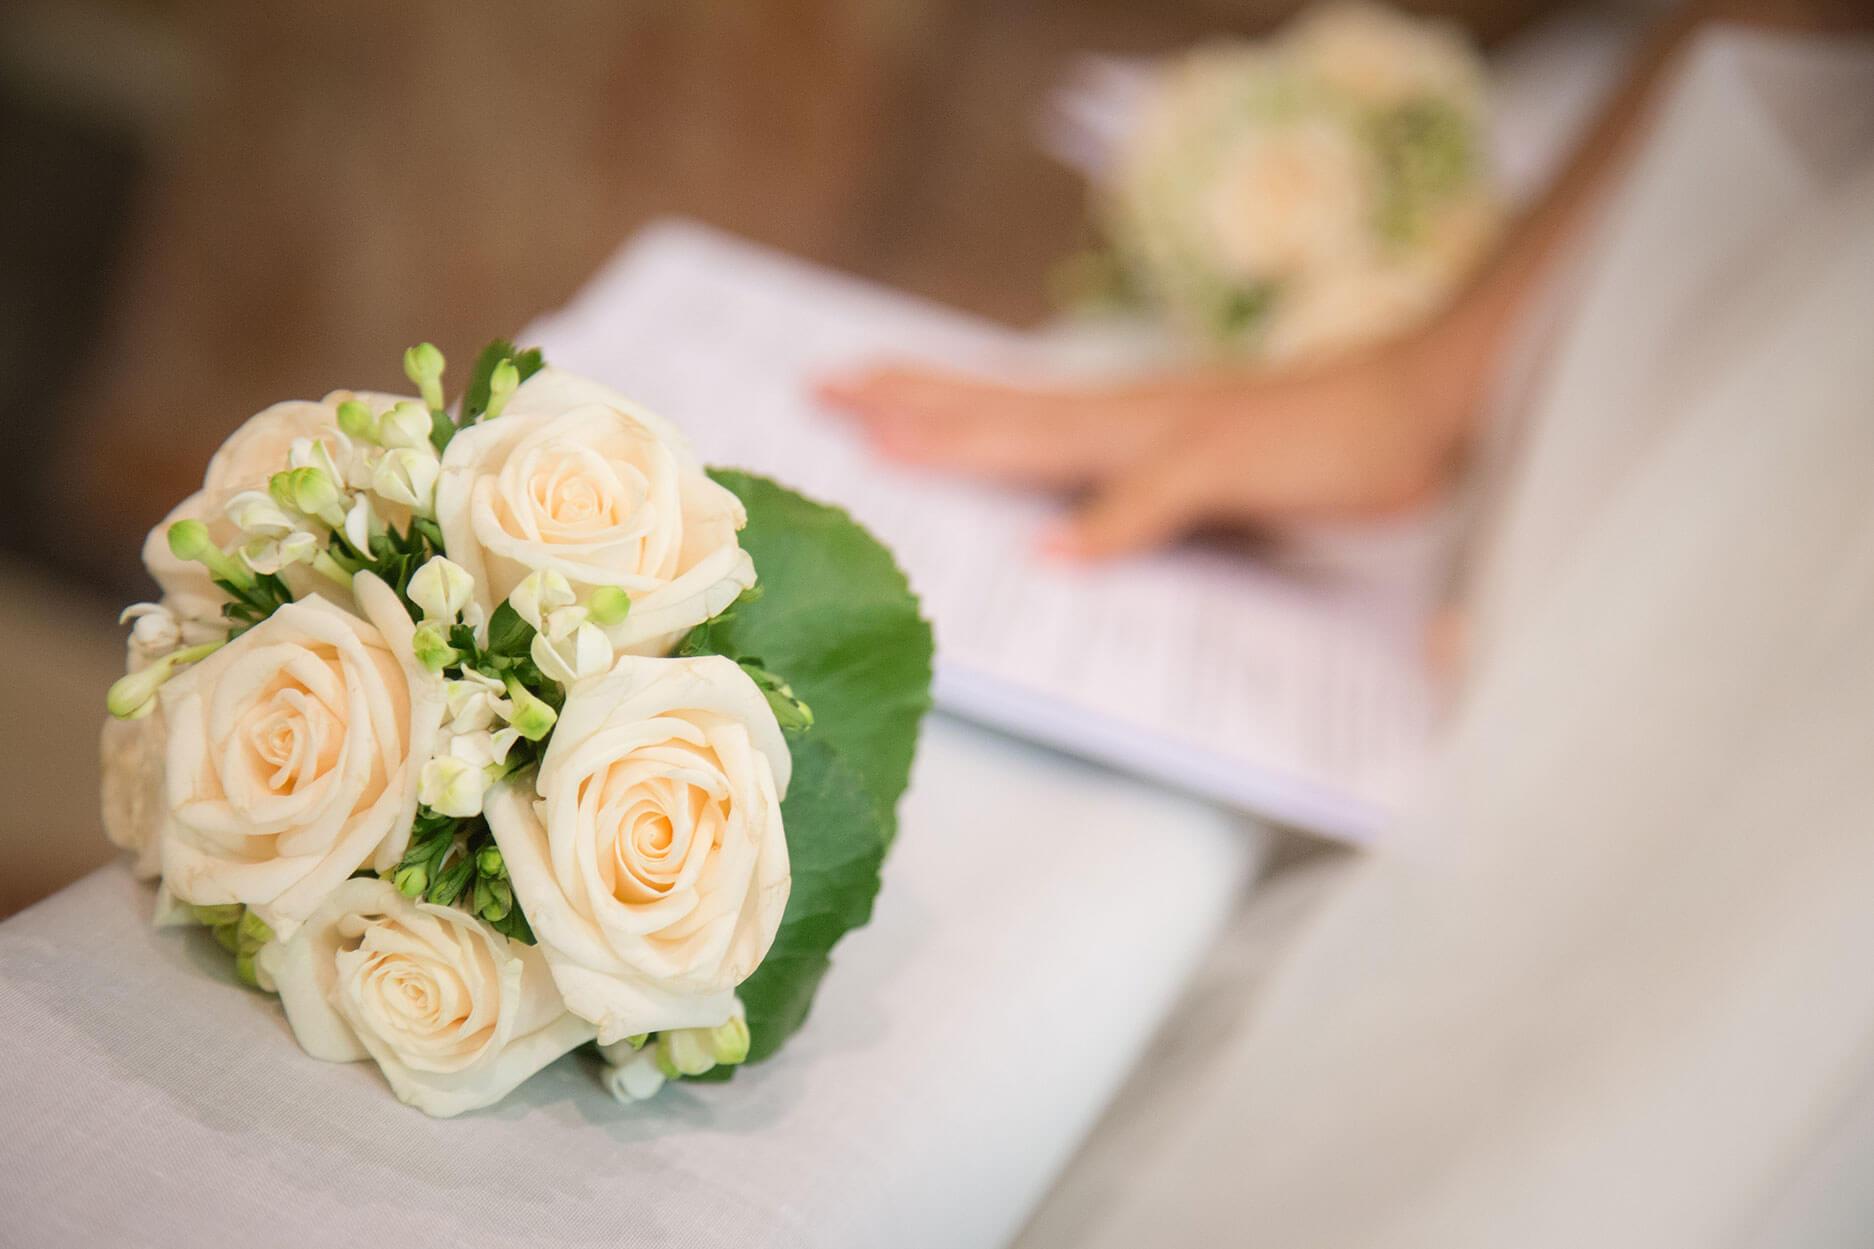 Francesca-Ferrati-wedding-photographer-Verona-Svetlana-Gianluigi19